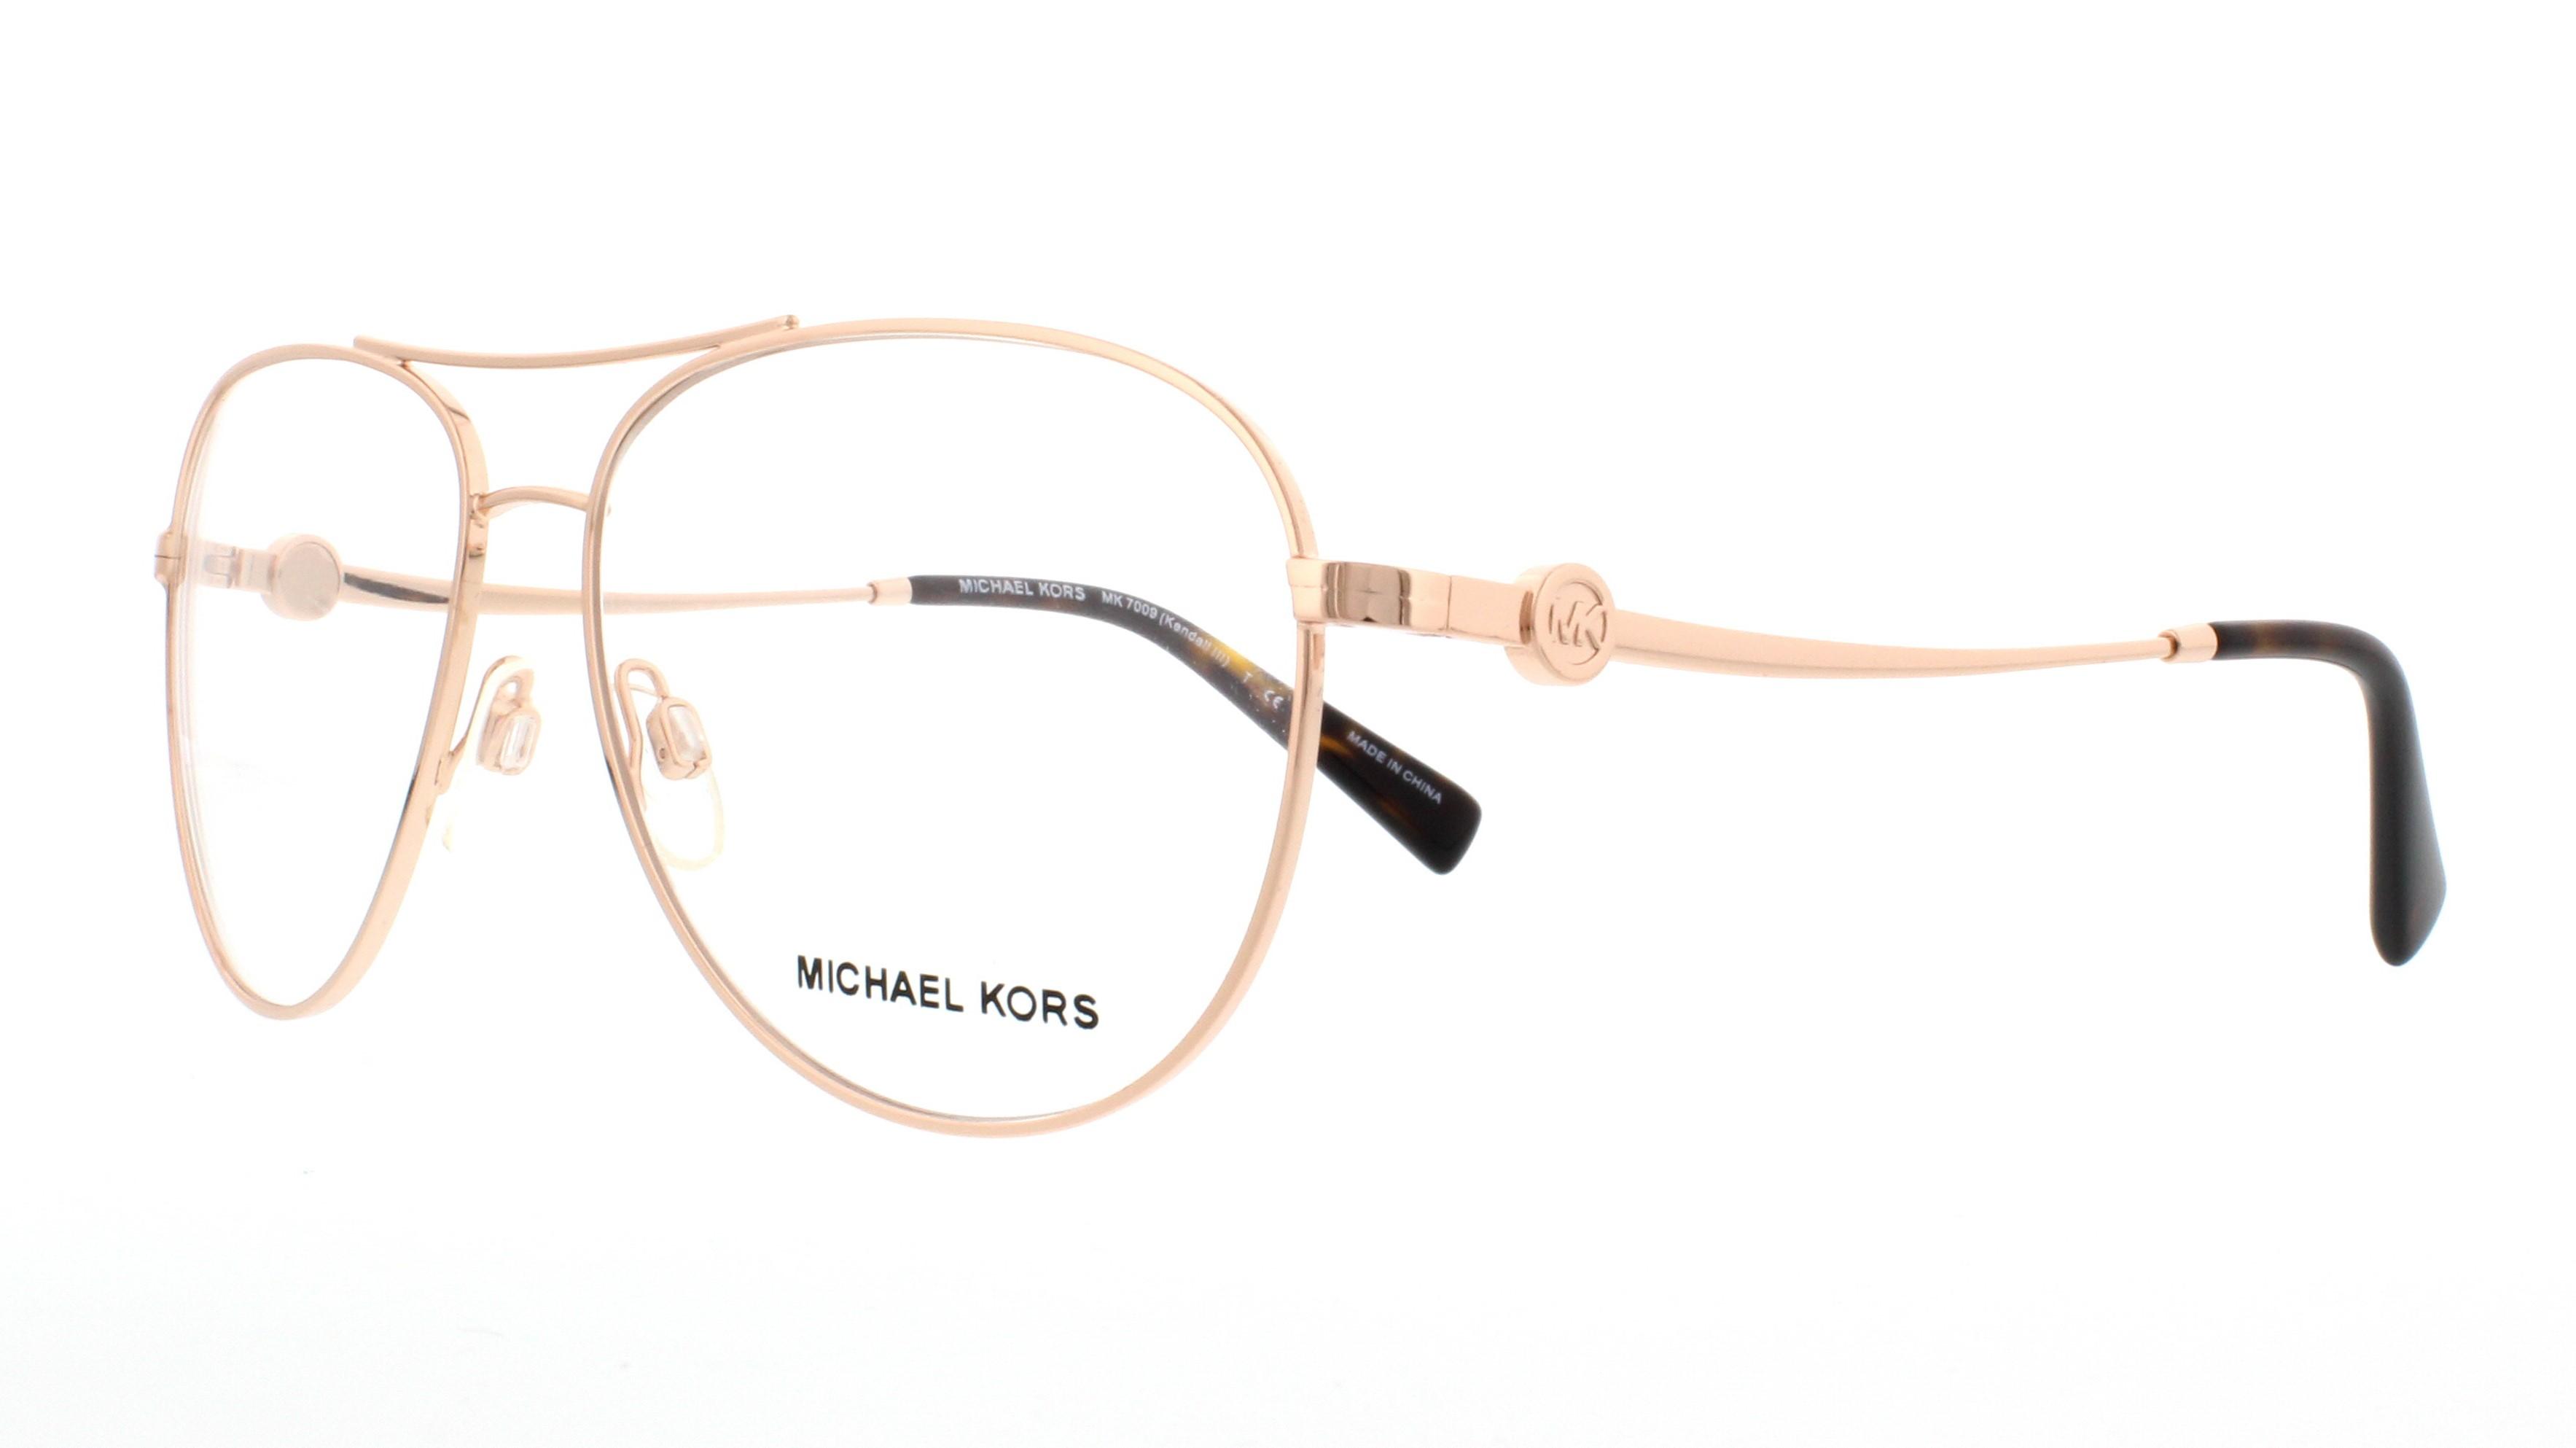 99e7cc8bc7 Designer Frames Outlet. Michael Kors MK7009